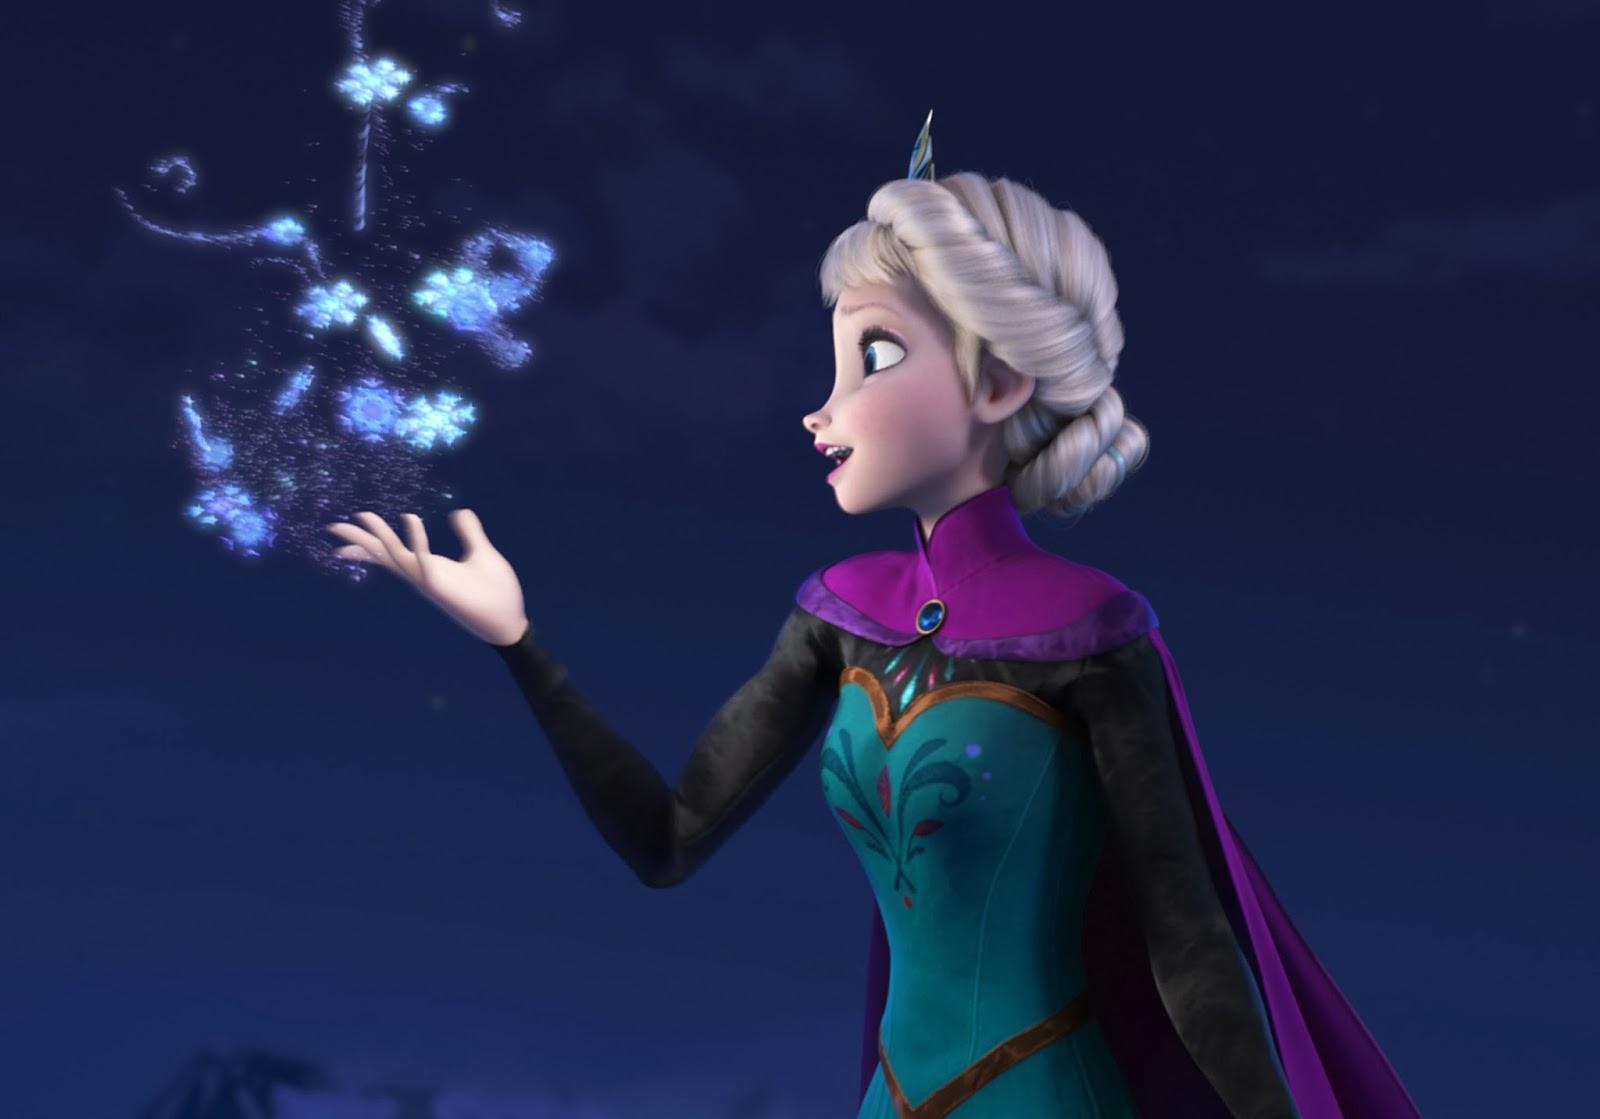 Imagens Frozen Uma Aventura Congelante Classy frozen: uma aventura congelante - livre estou